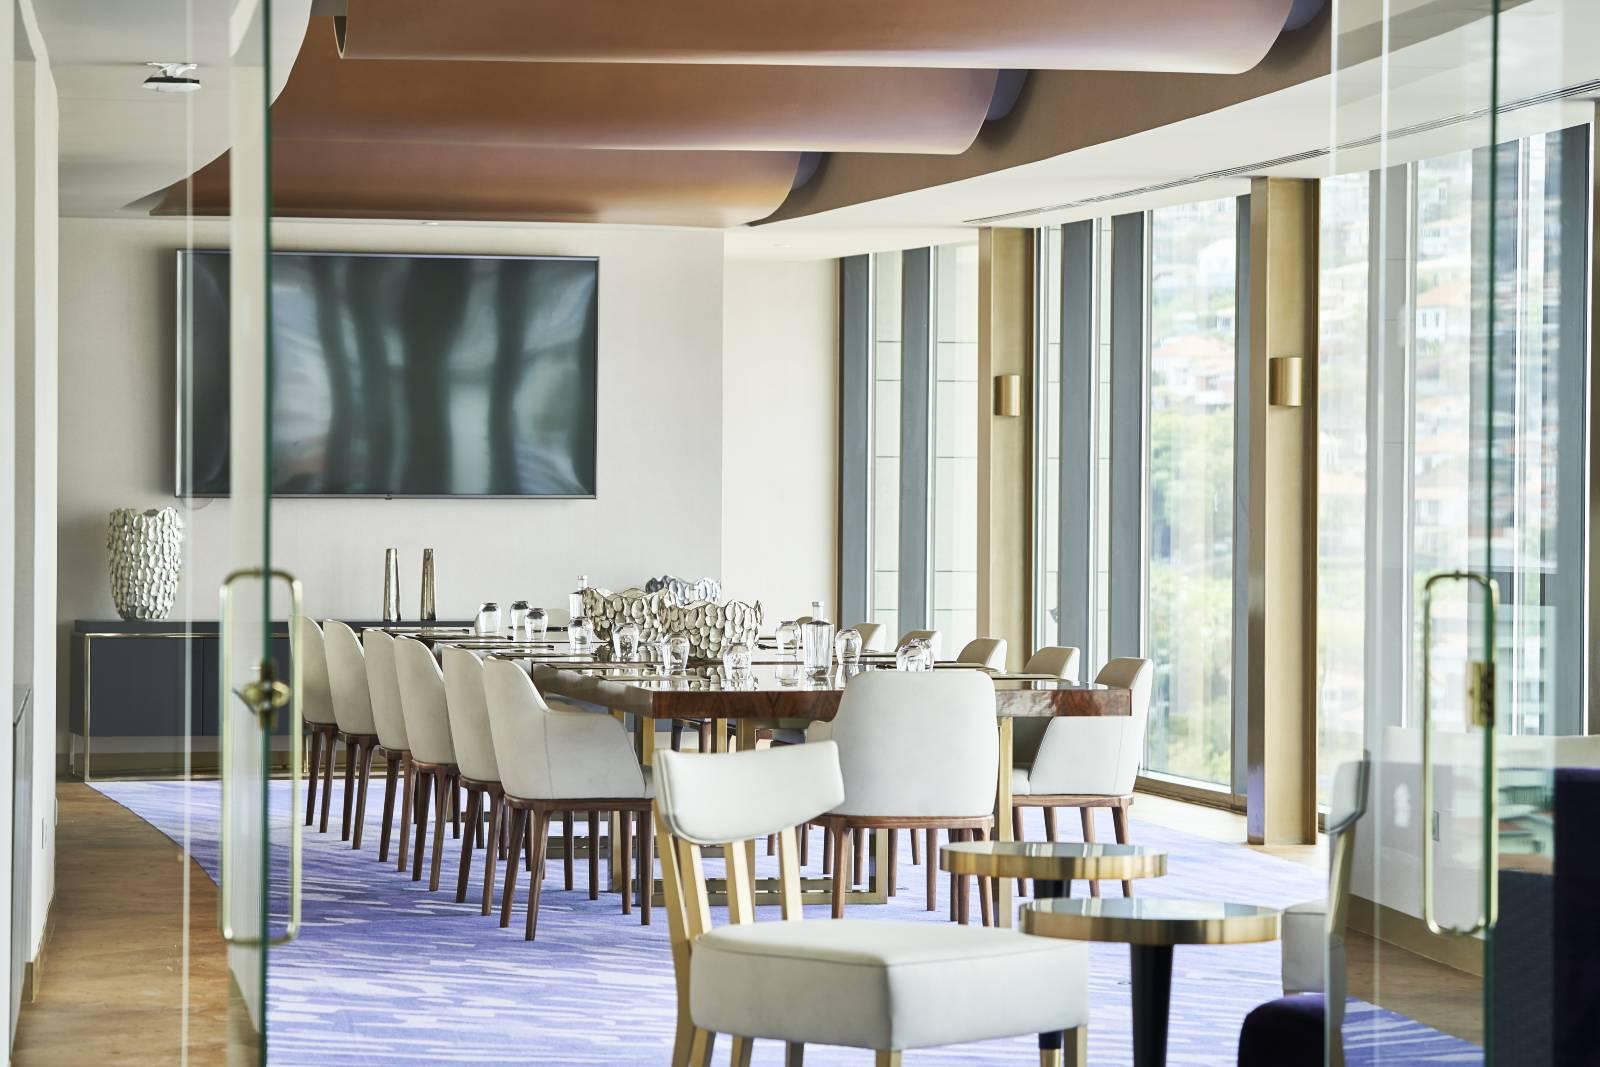 application-Portugal Savoy Palace Hotel-GOJO-img